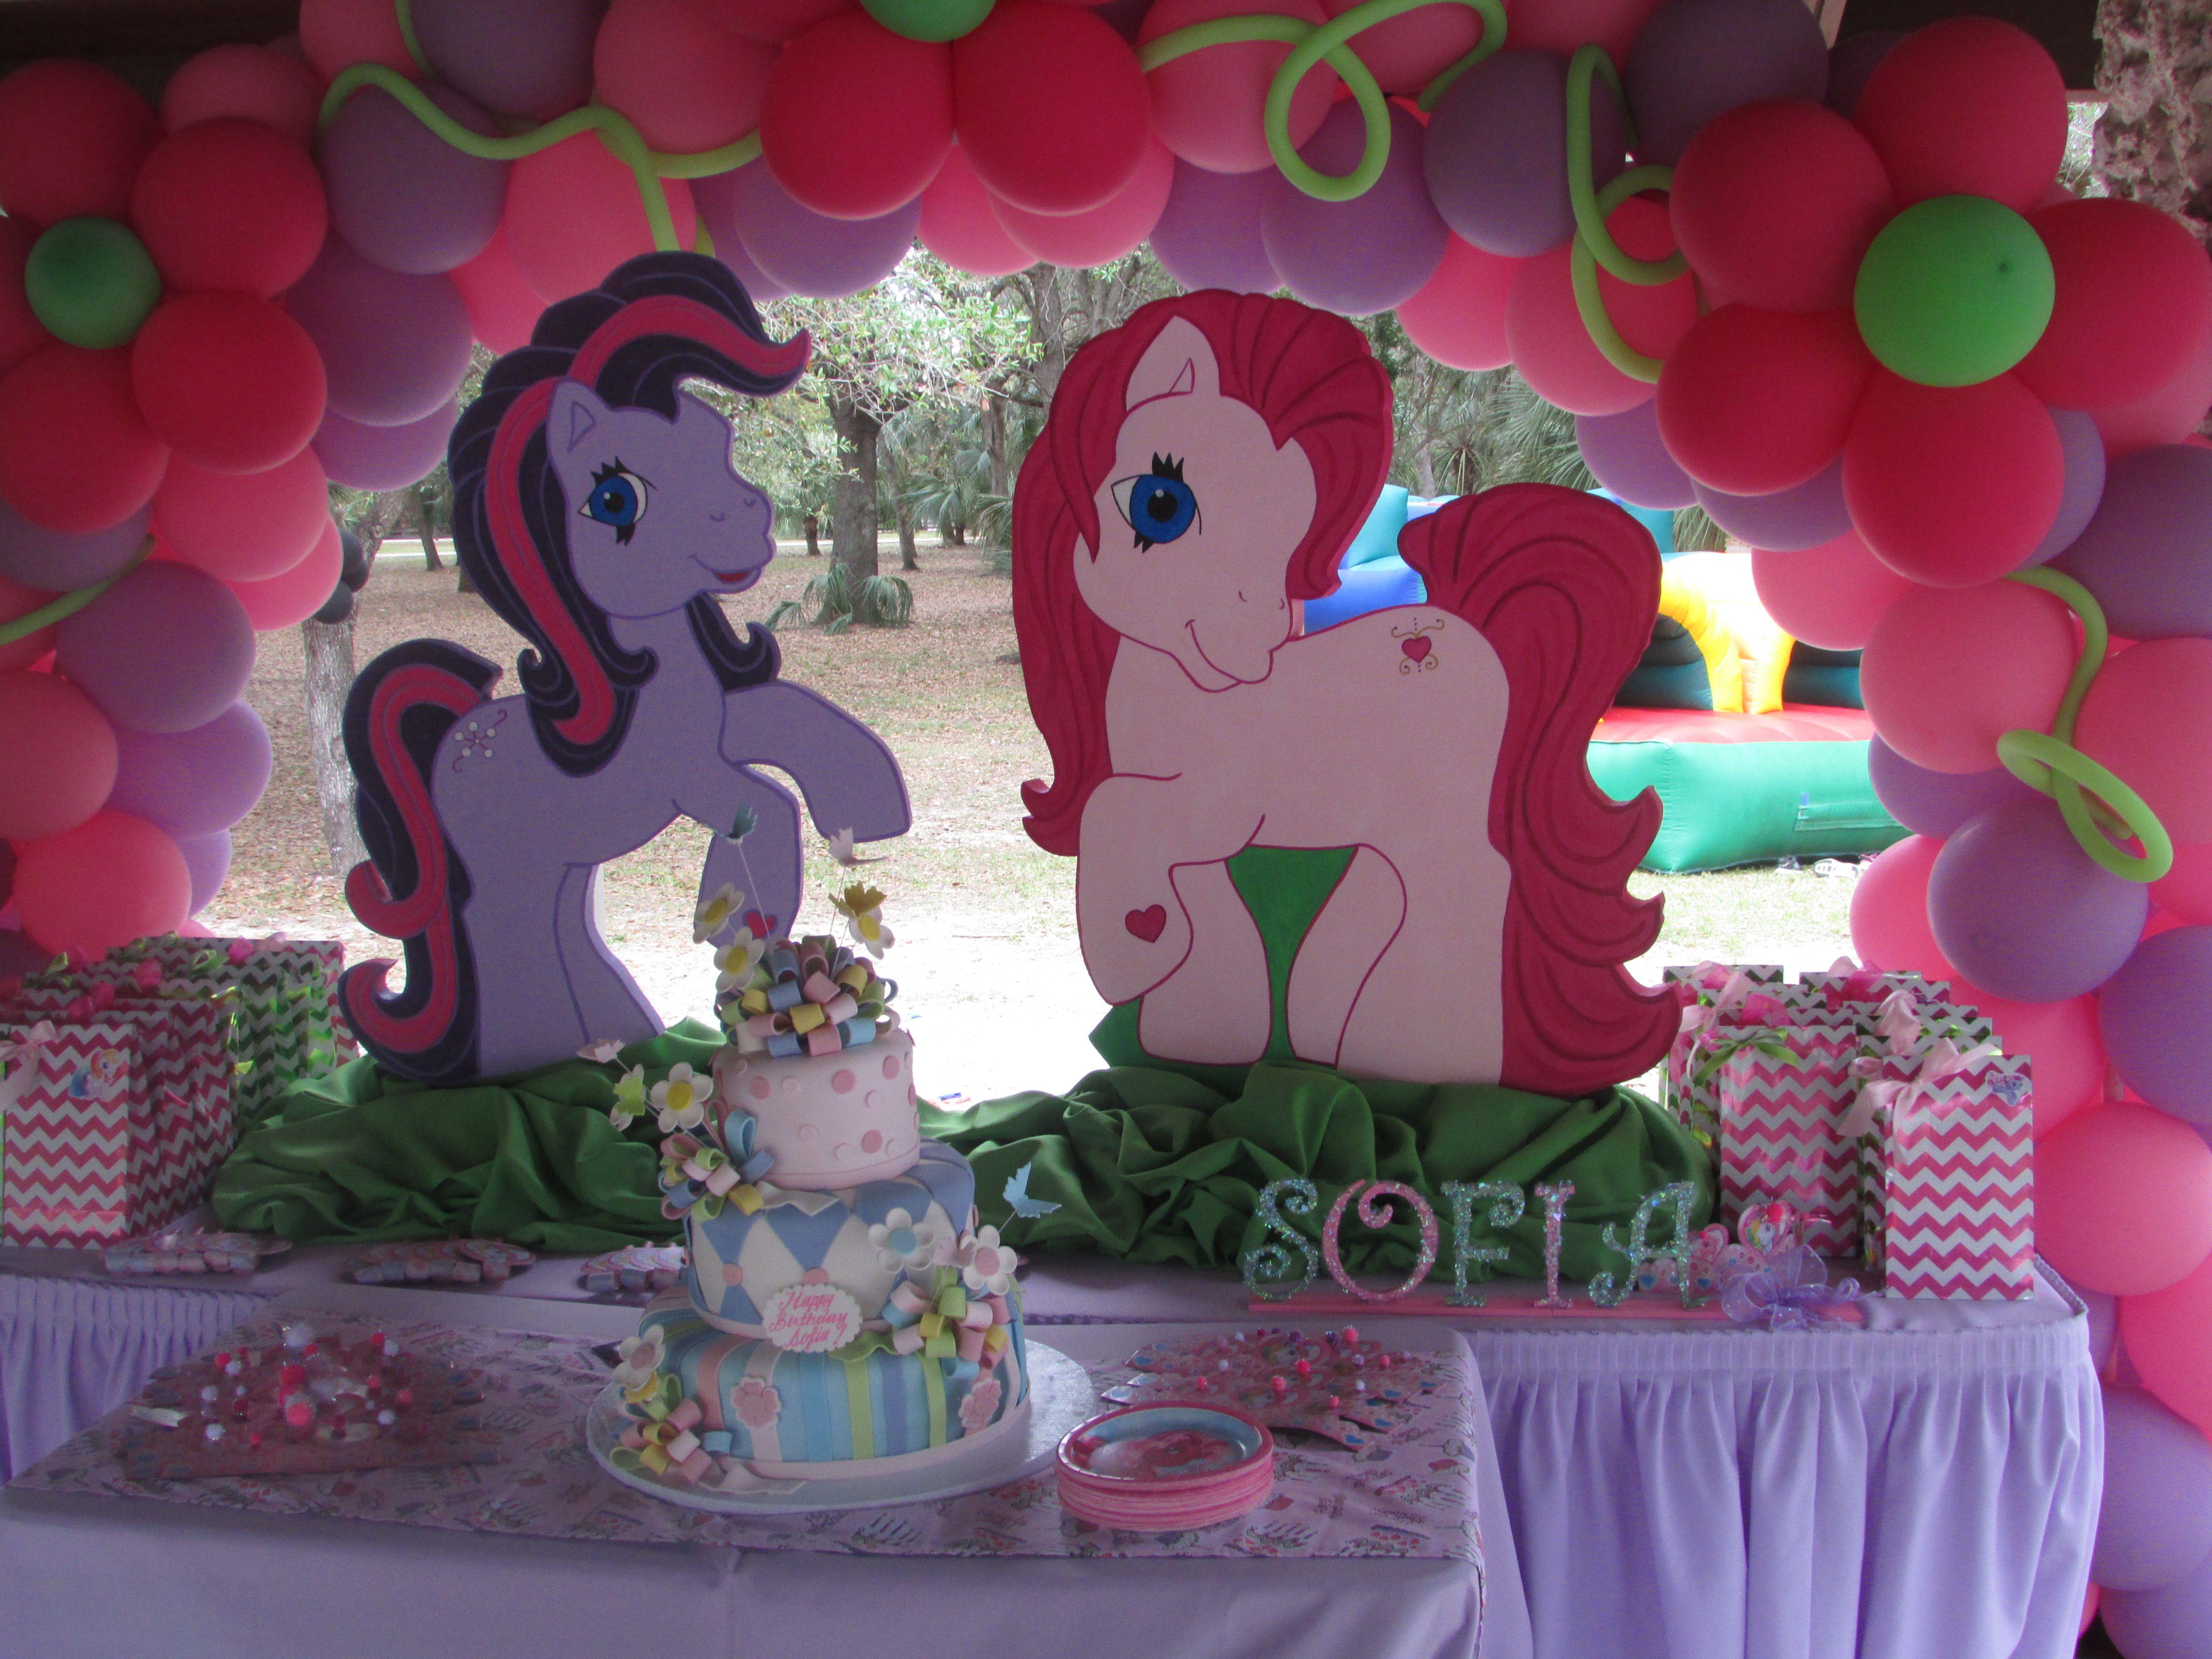 My Little Pony Birthday Cake Table Decor Pink Purple Birthday My Little Pony Birthday Pony Birthday Party My Little Pony Birthday Party